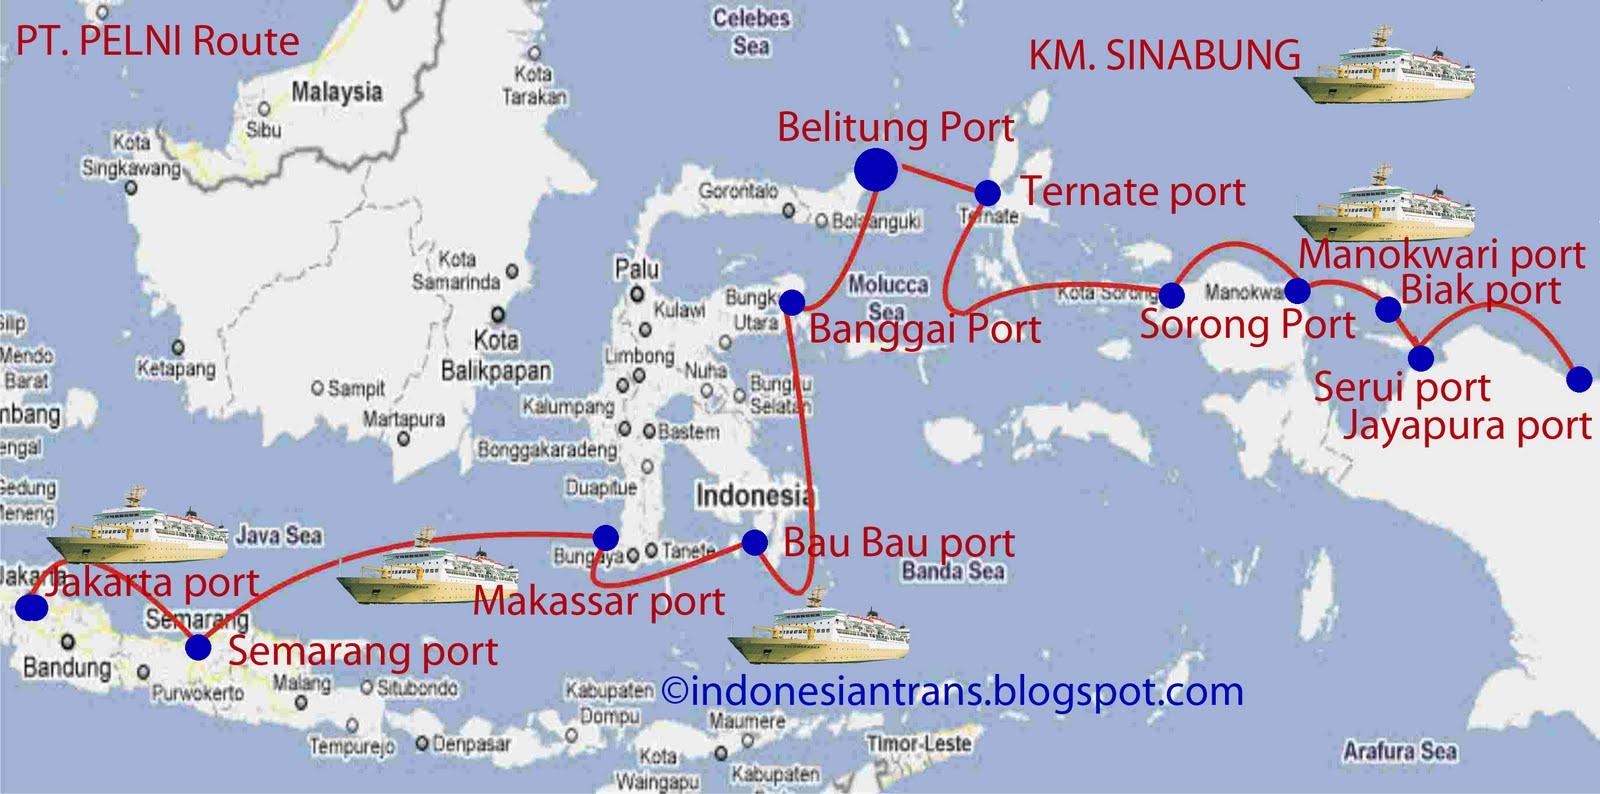 Jadwal Kapal Pelni 2013 Situs Resmi Ptpelni Persero Km Sinabung